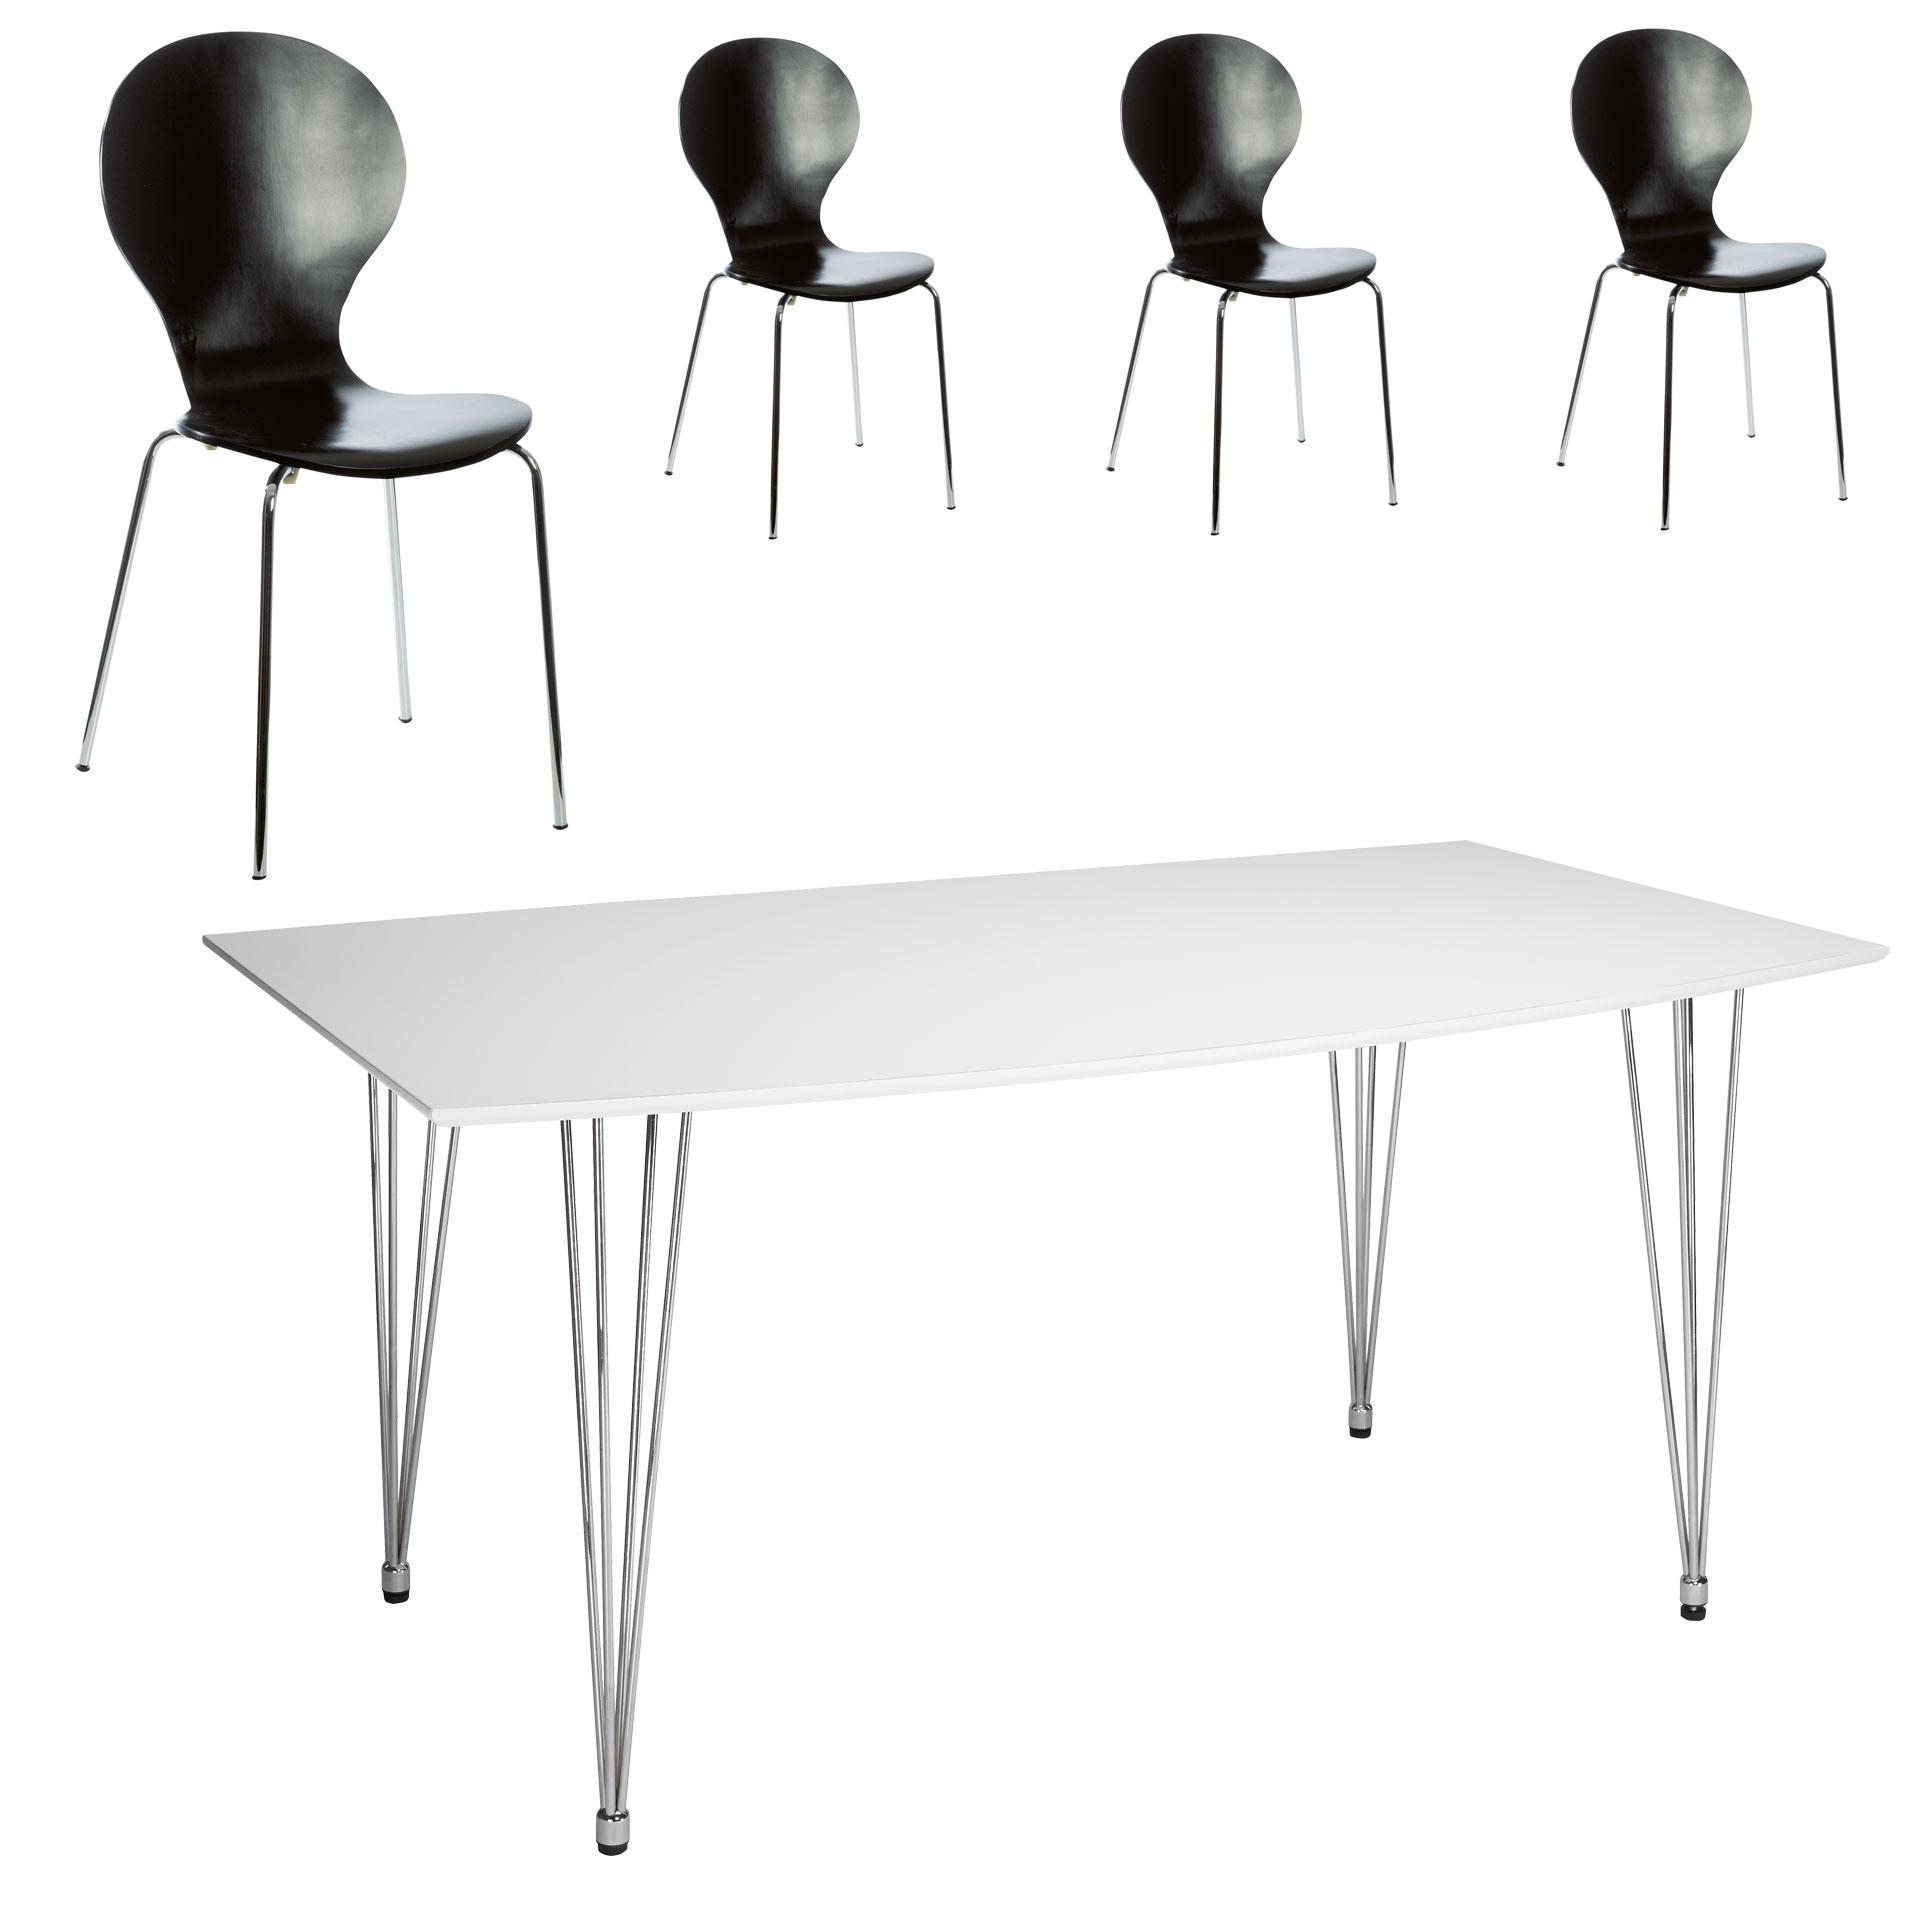 Essgruppe Fabian/Fanny (90x160, 4 Stühle, schwarz)